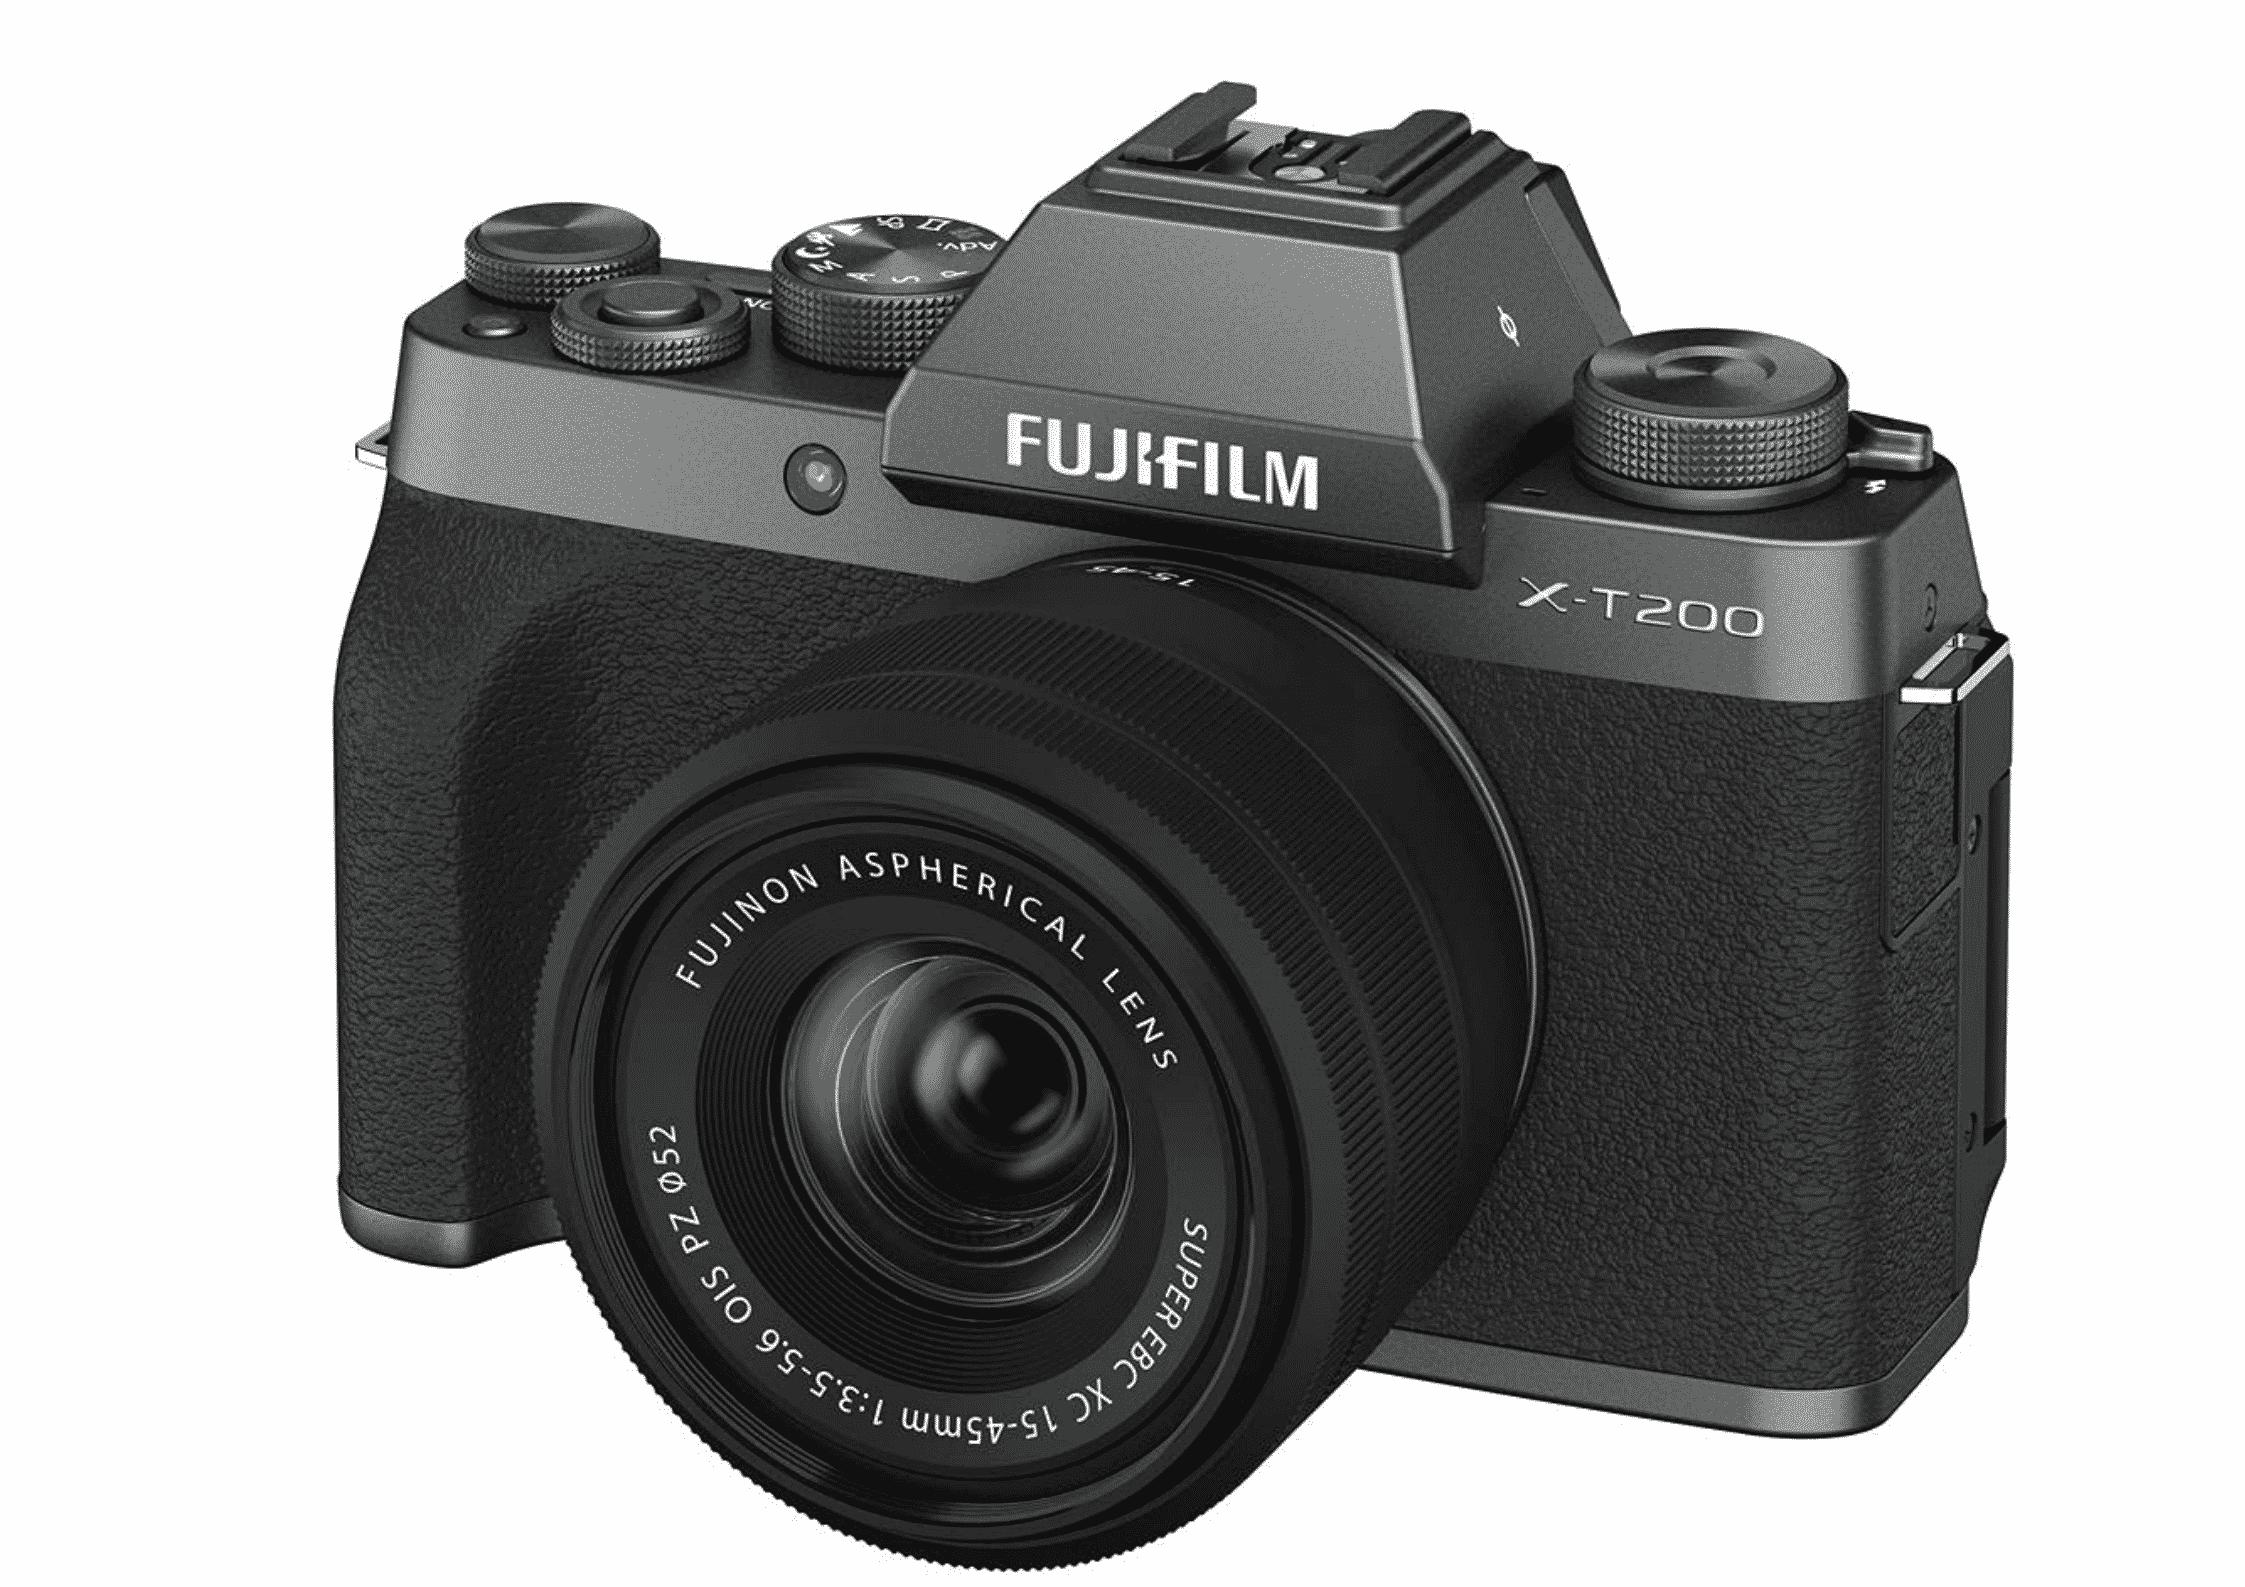 Fujifilm XT-200 - Best mirrorless camera for beginners